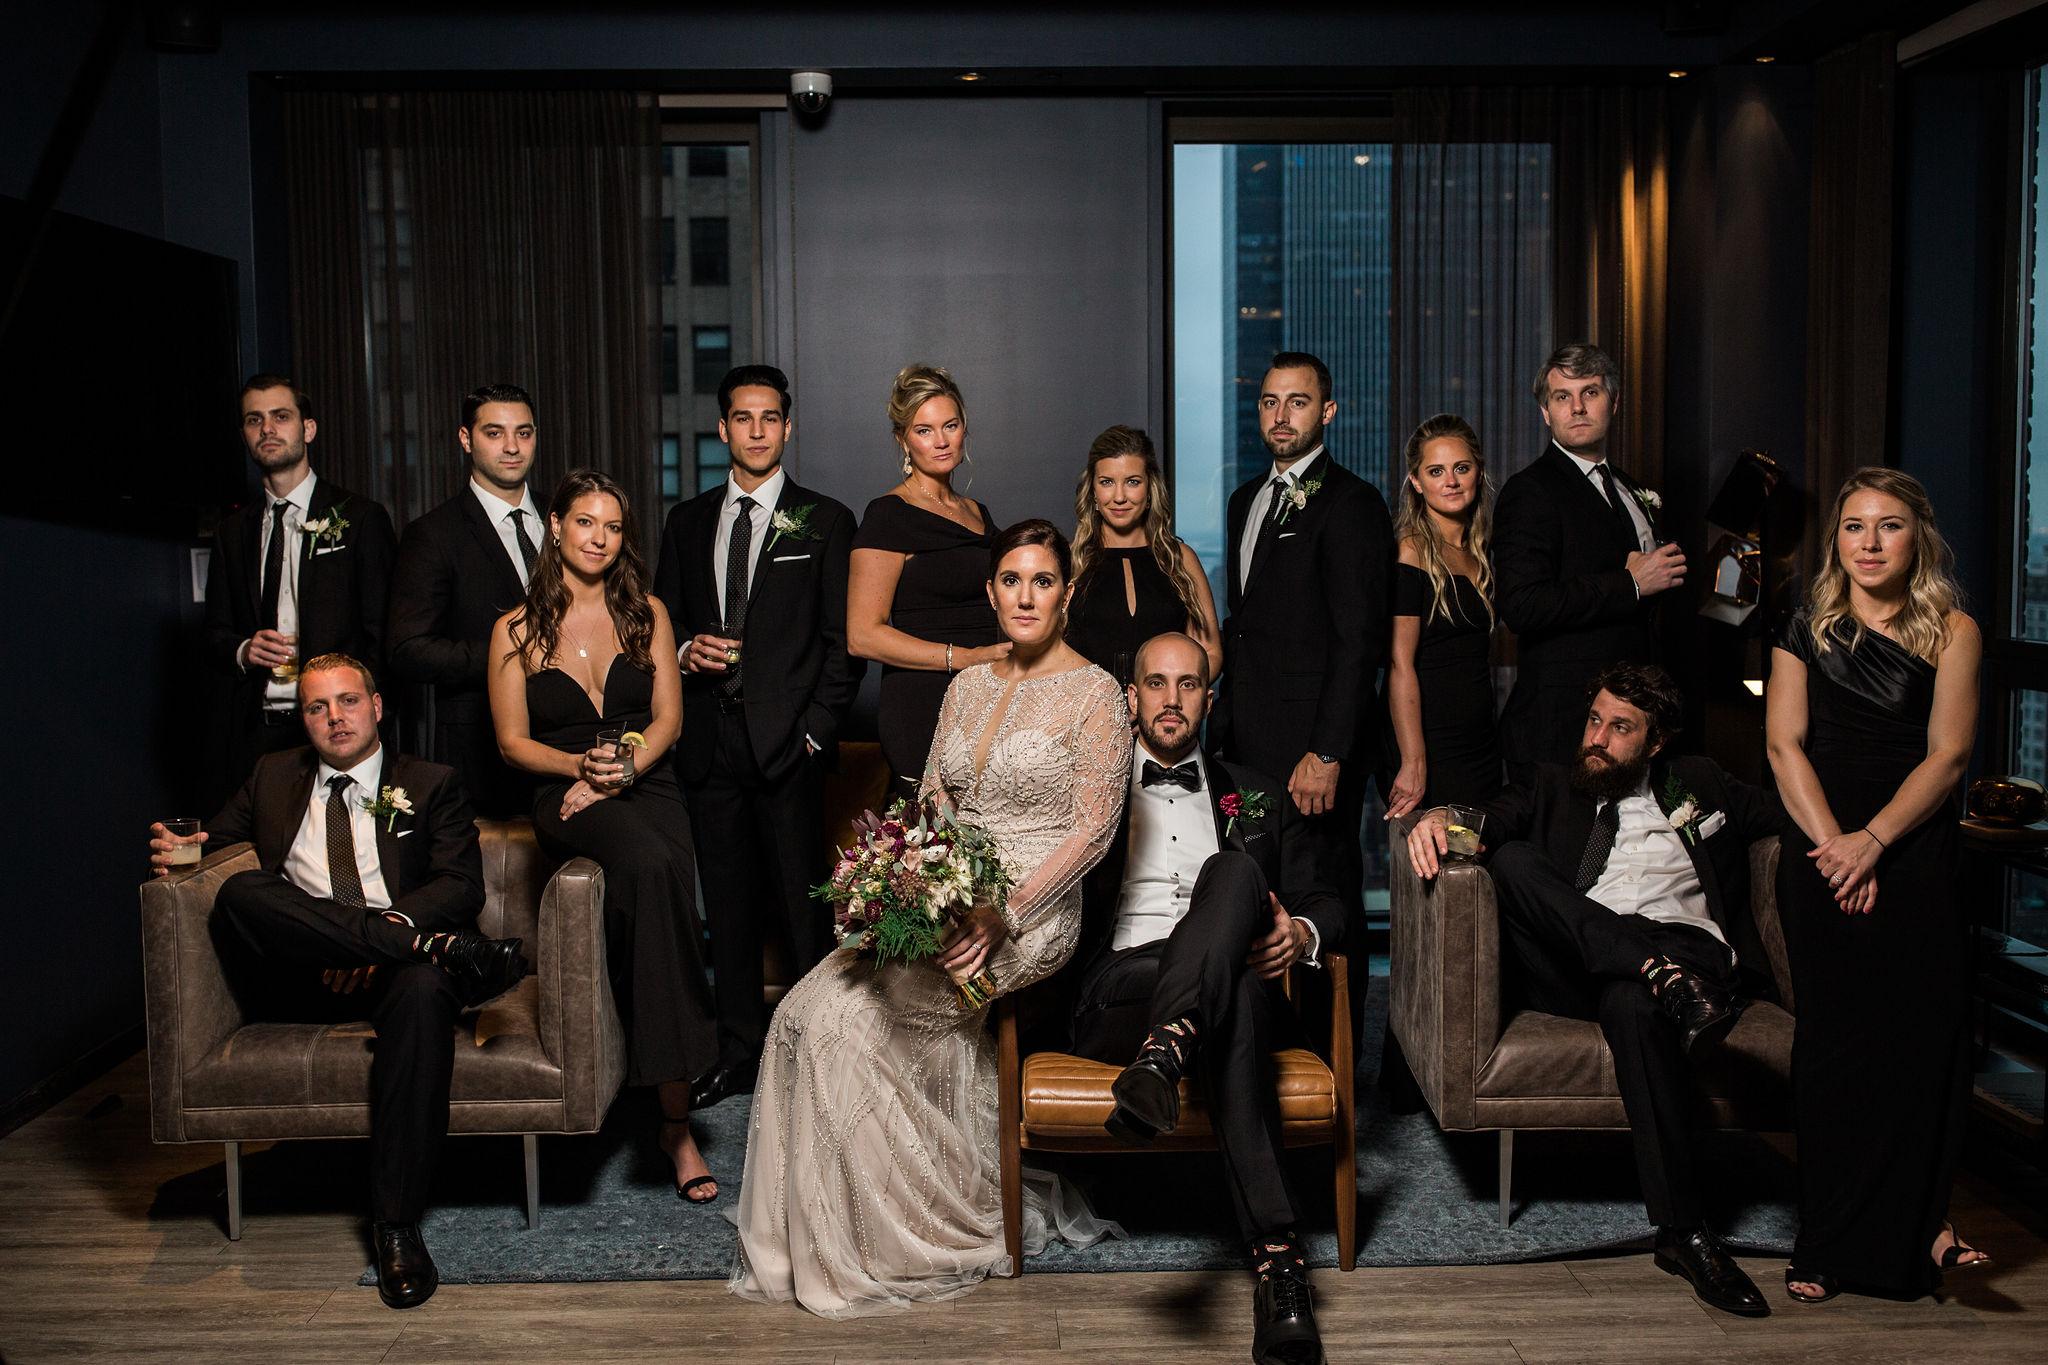 connecticut wedding 15.jpg